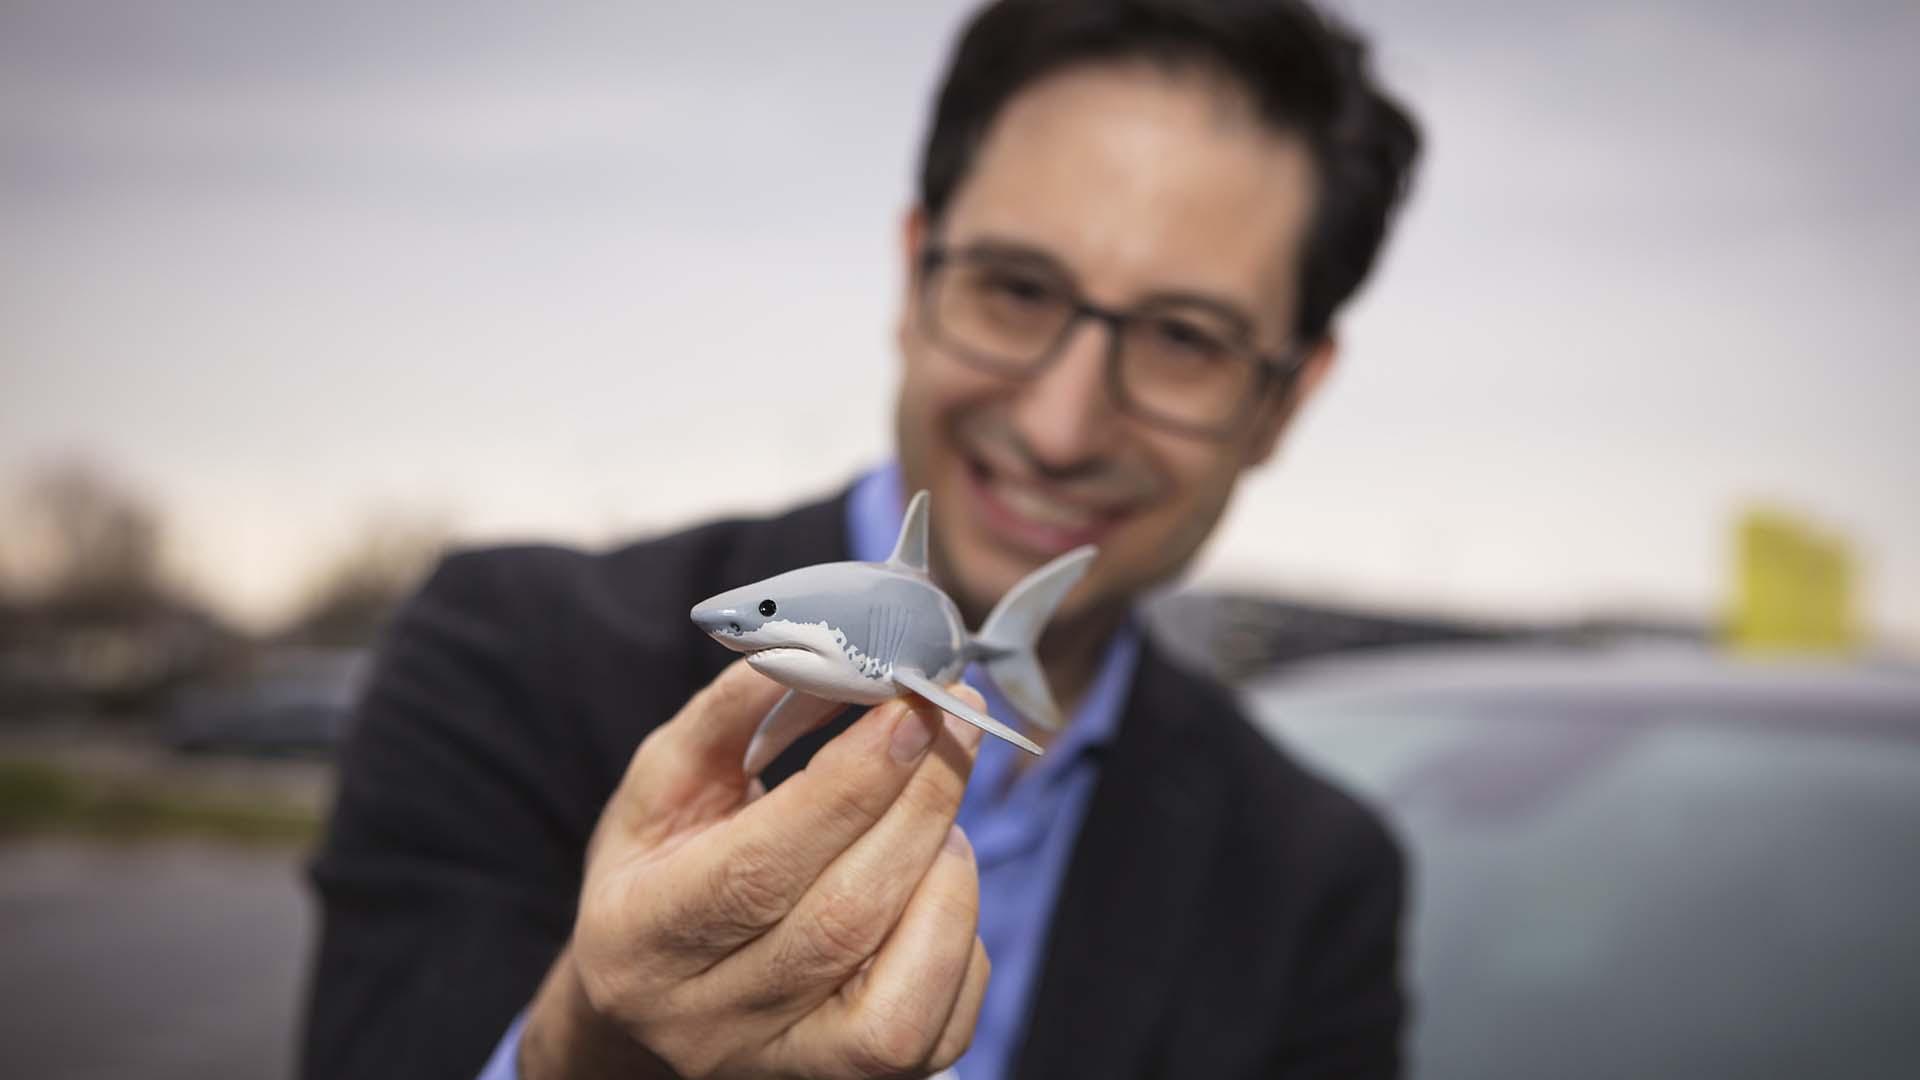 When car designers jump the shark